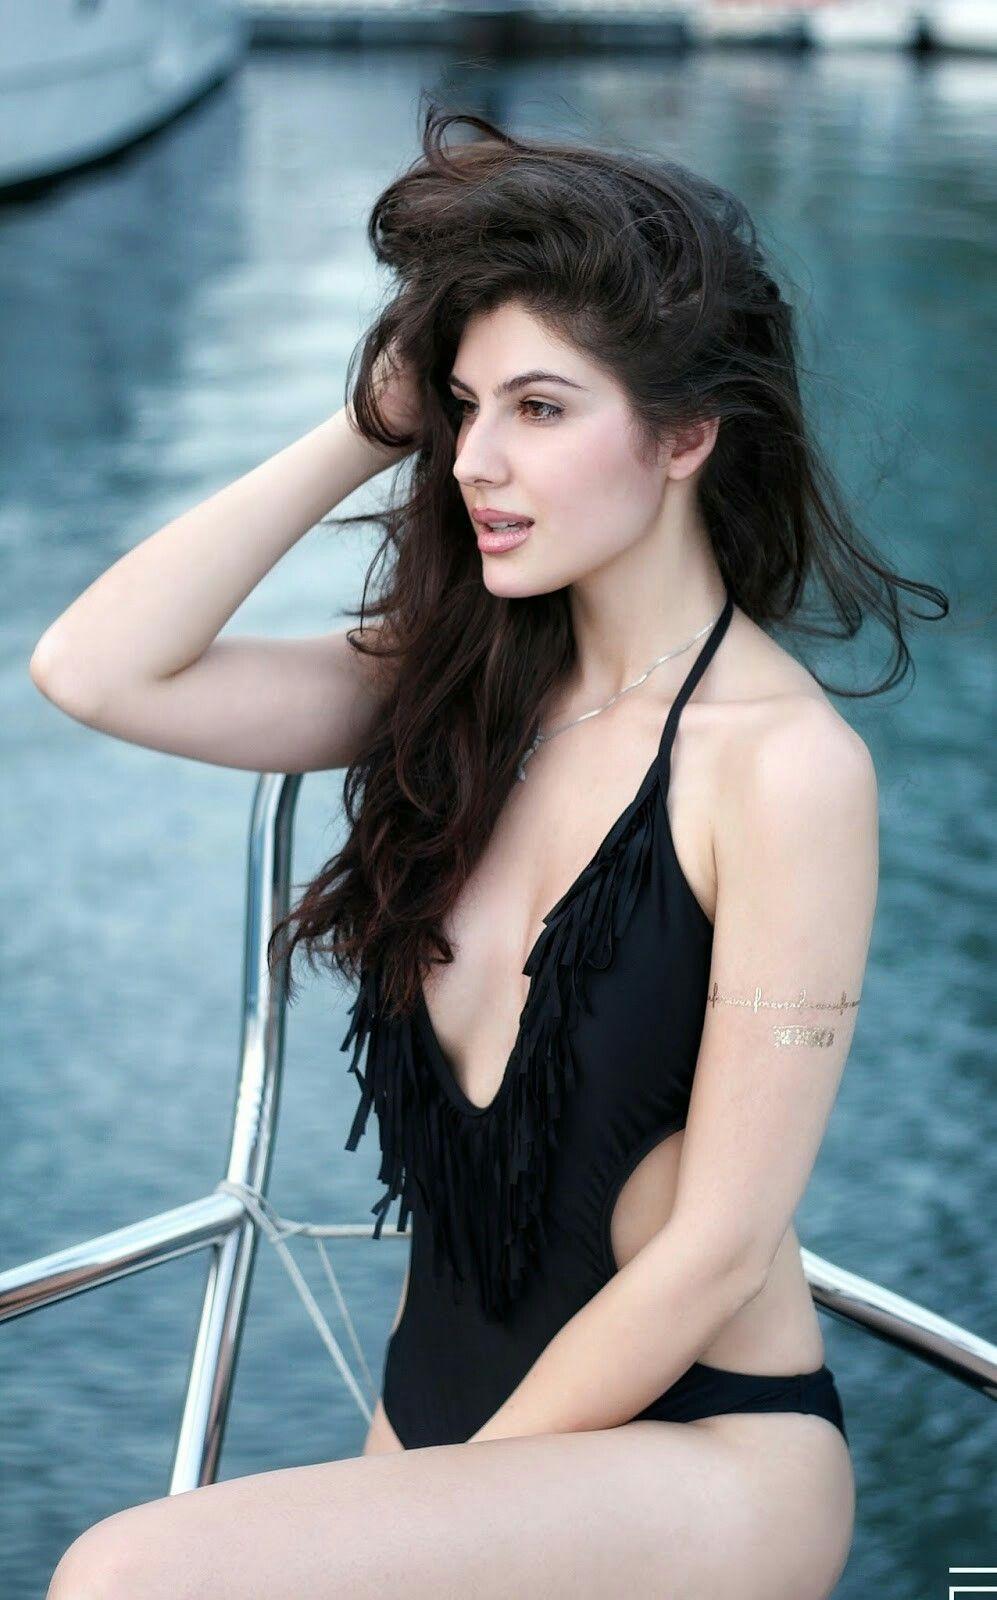 Sexy pictures of sarah michelle gellar-2340